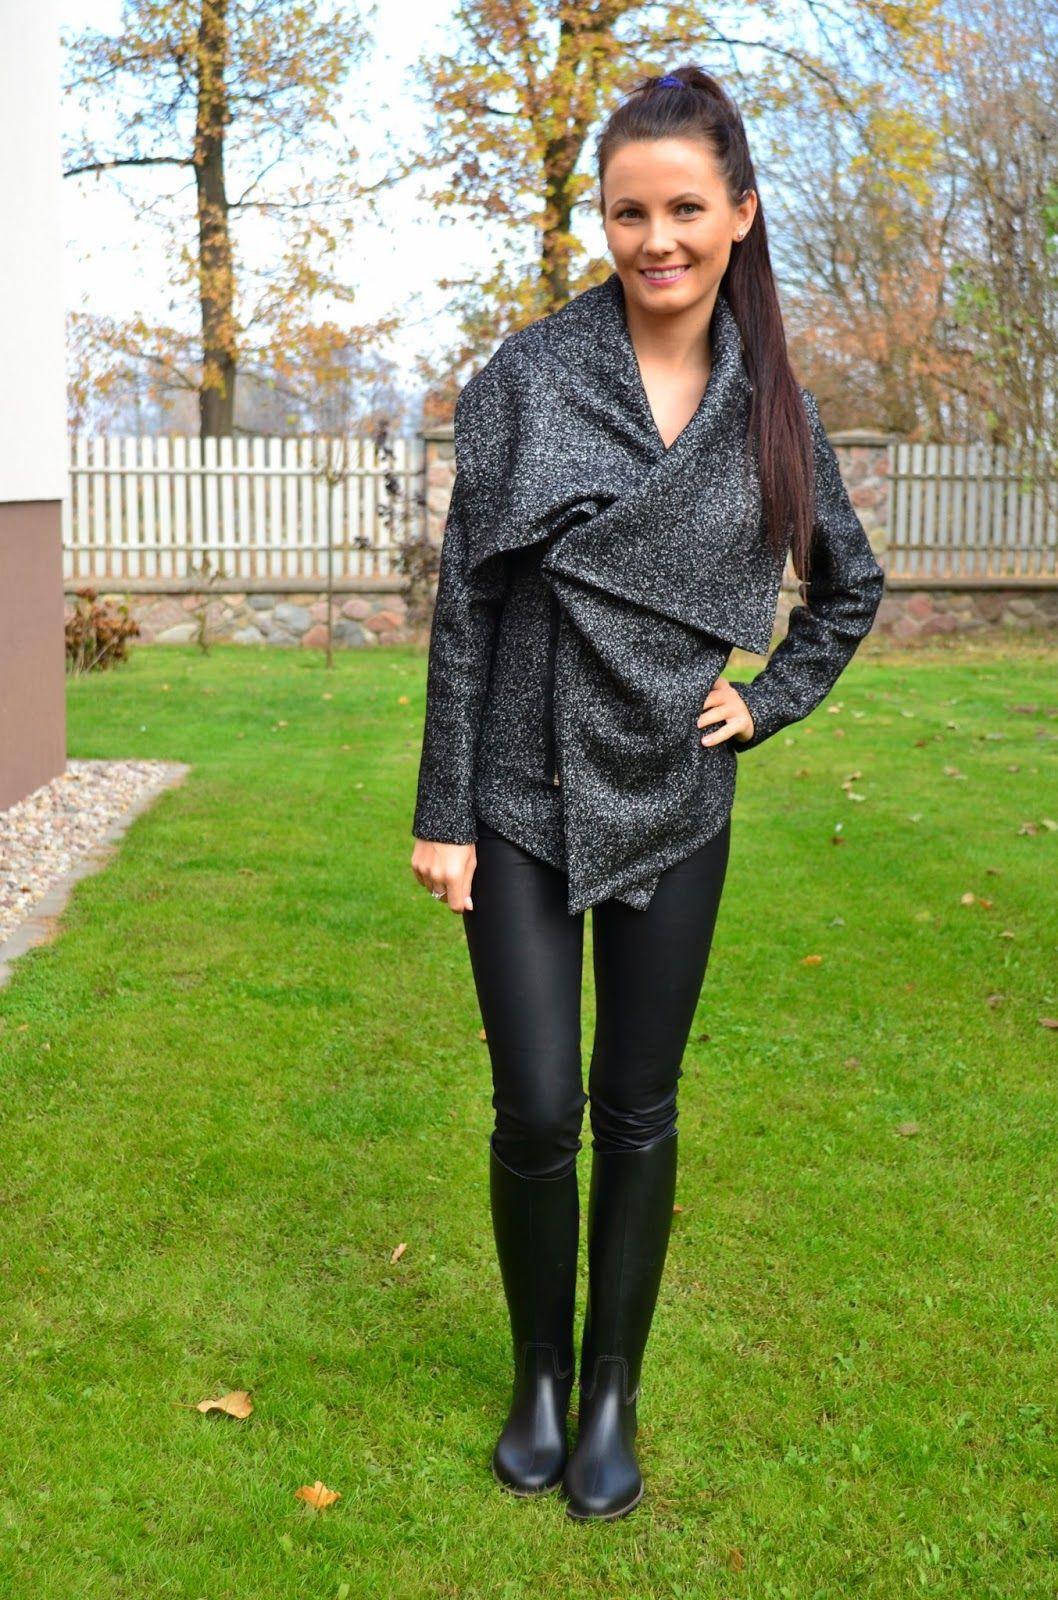 Polka dot wellingtons outfit. | PolskieSzafiarki.pl i